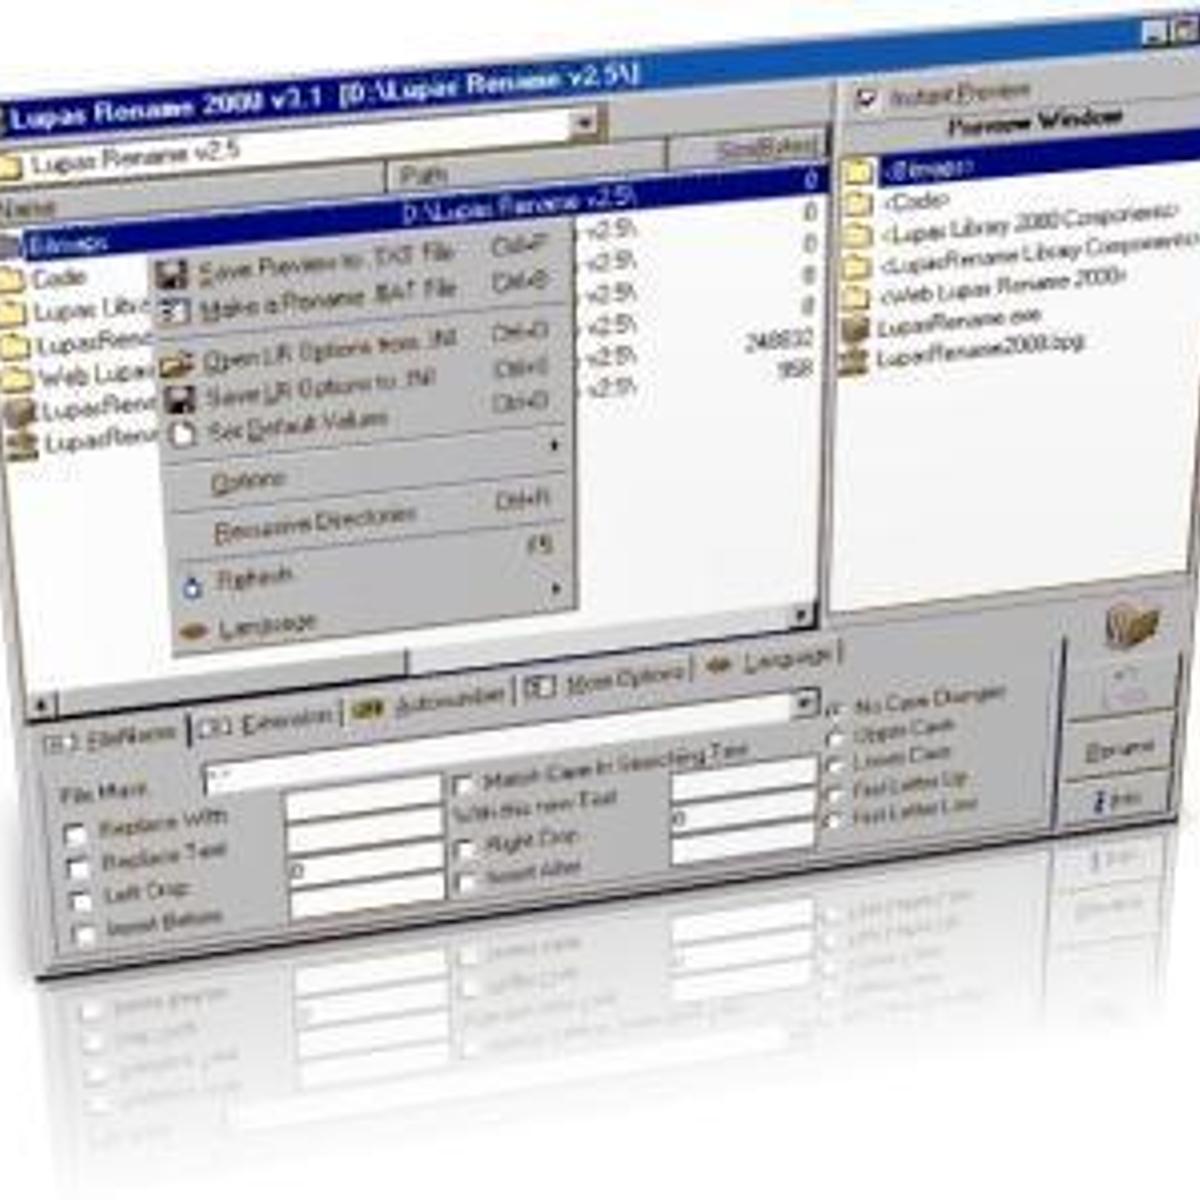 Lupas Rename 2000 Alternatives and Similar Software